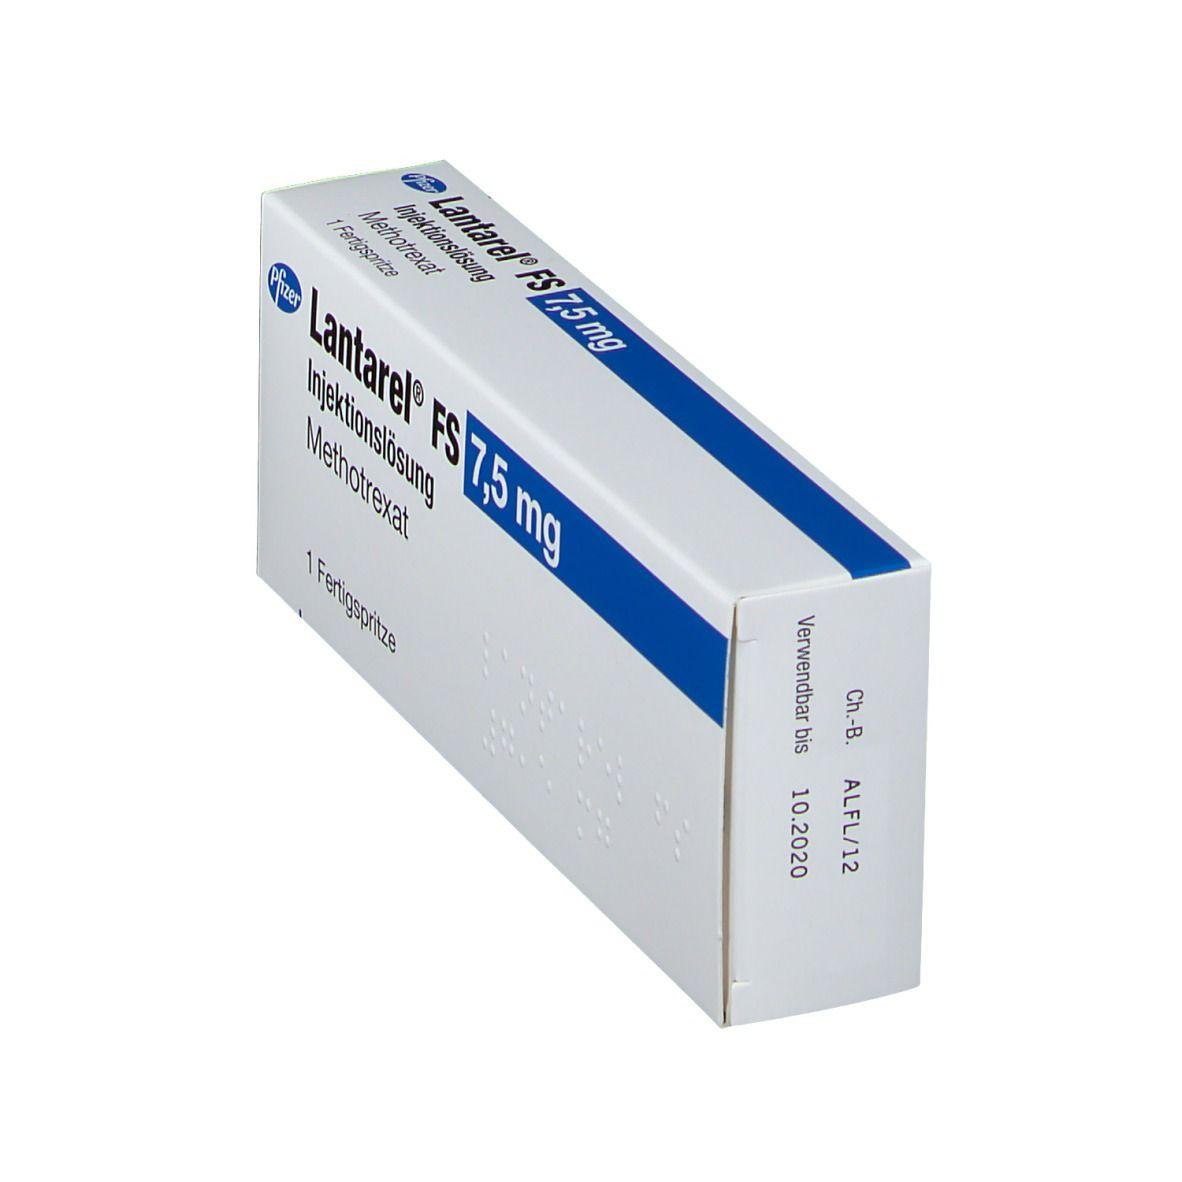 LANTAREL FS 7,5 mg 25 mg/ml Fertigspritzen